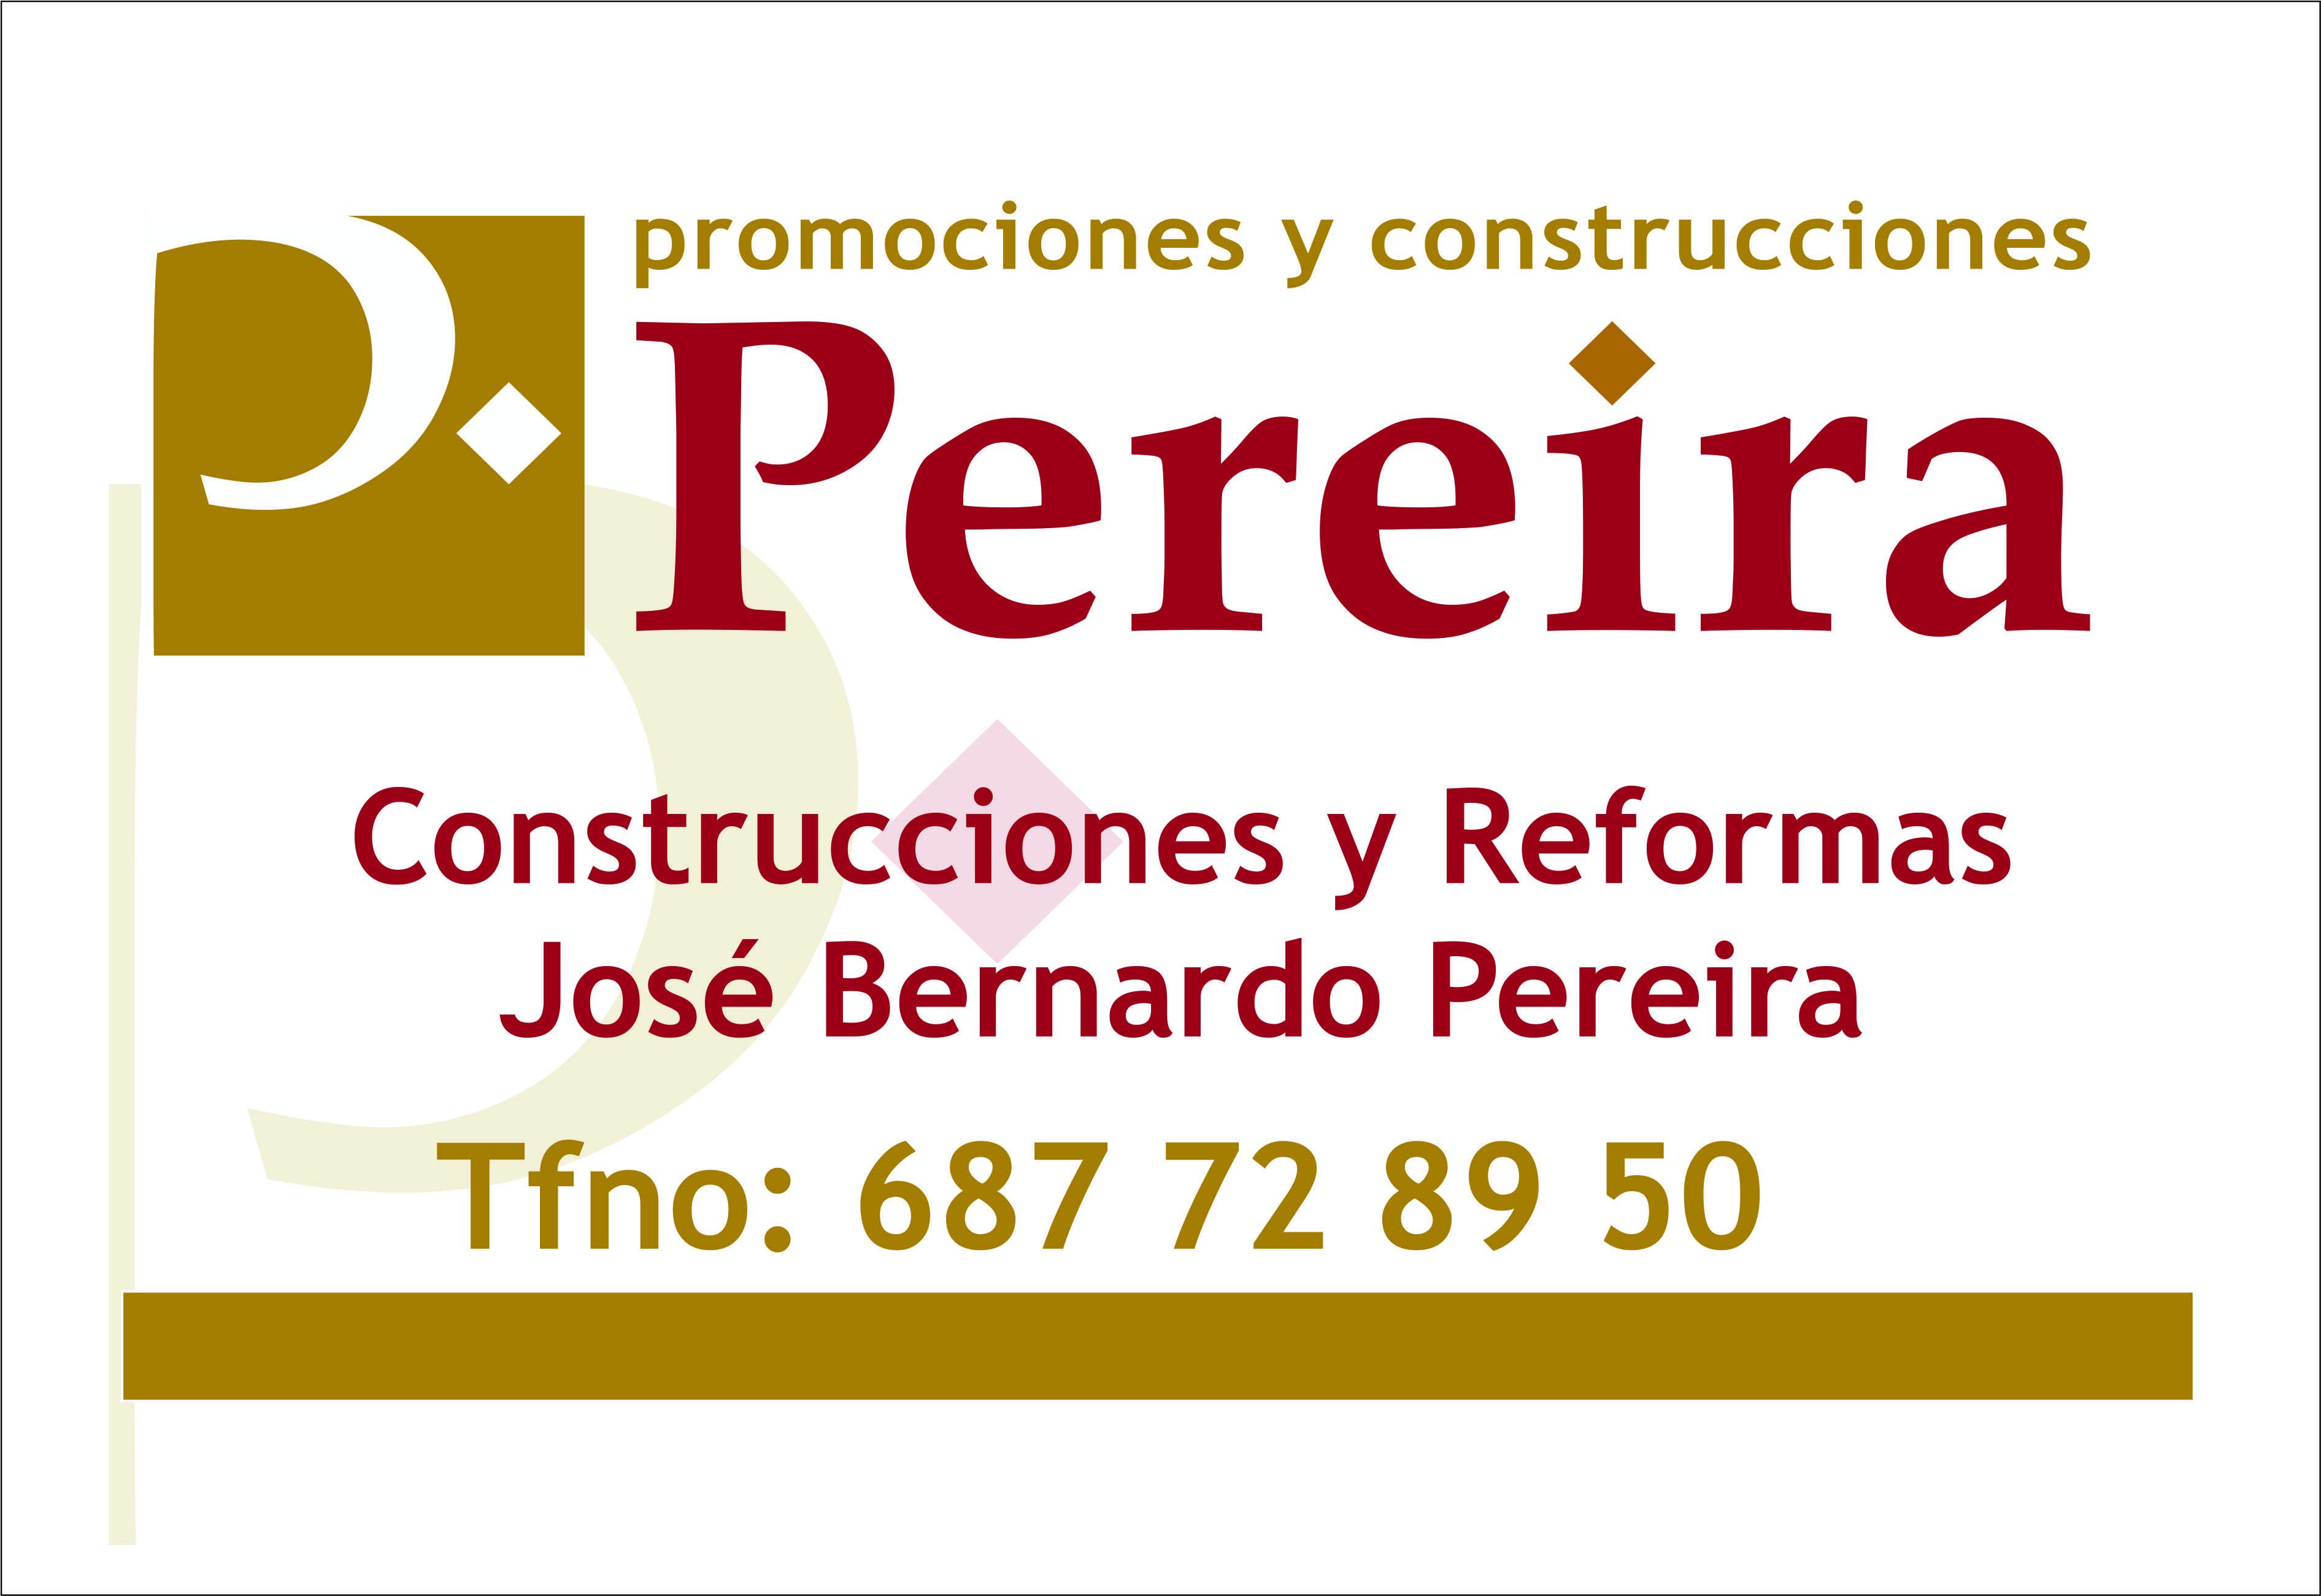 Reformas Jose Bernardo Pereira